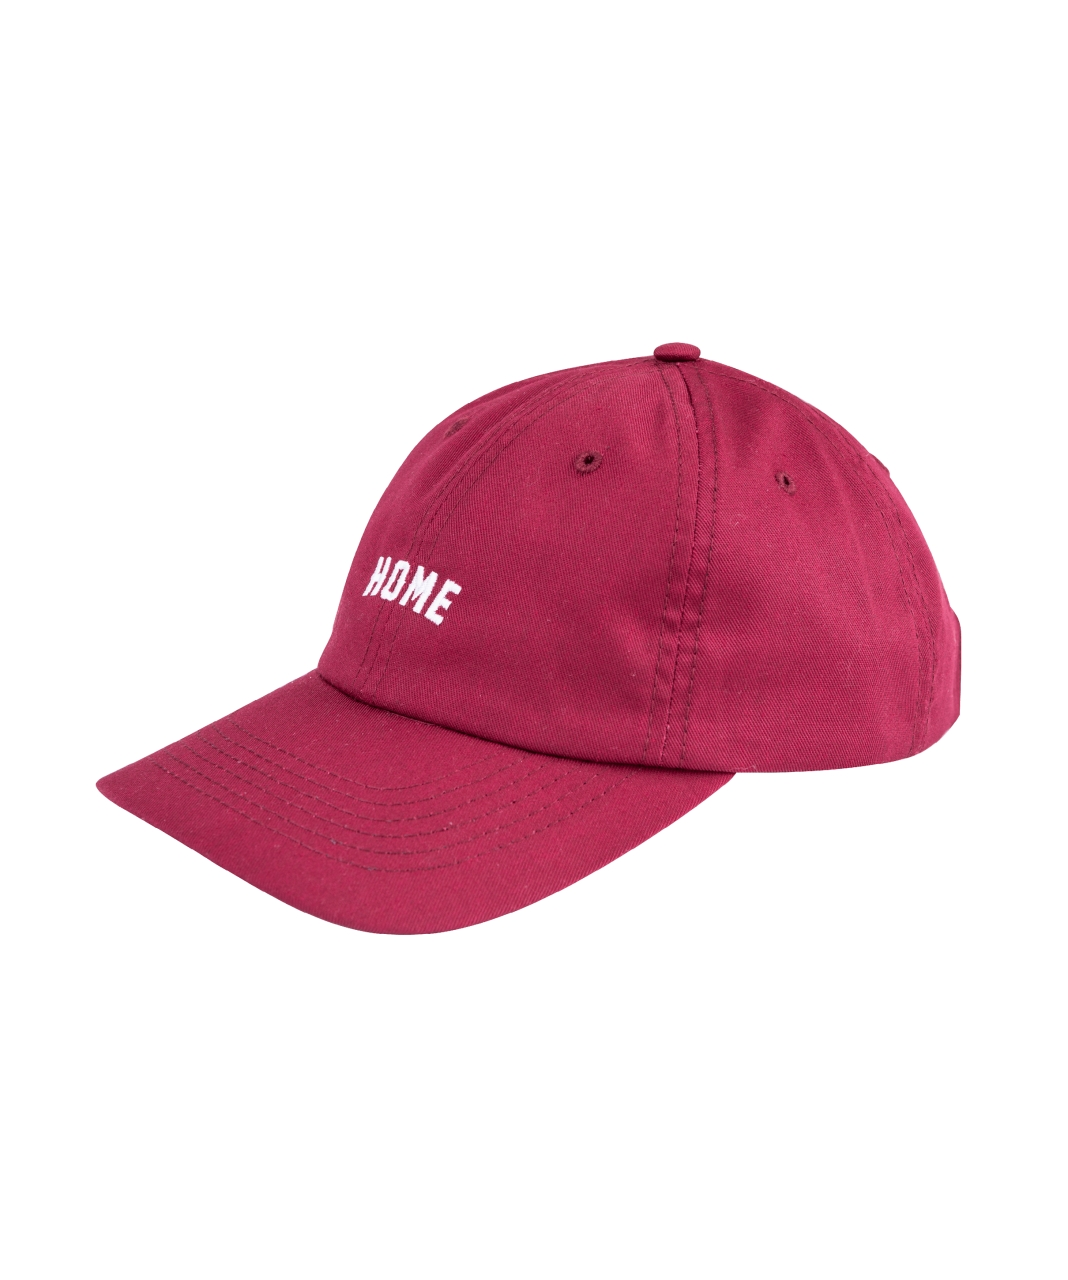 Home Dad Hat